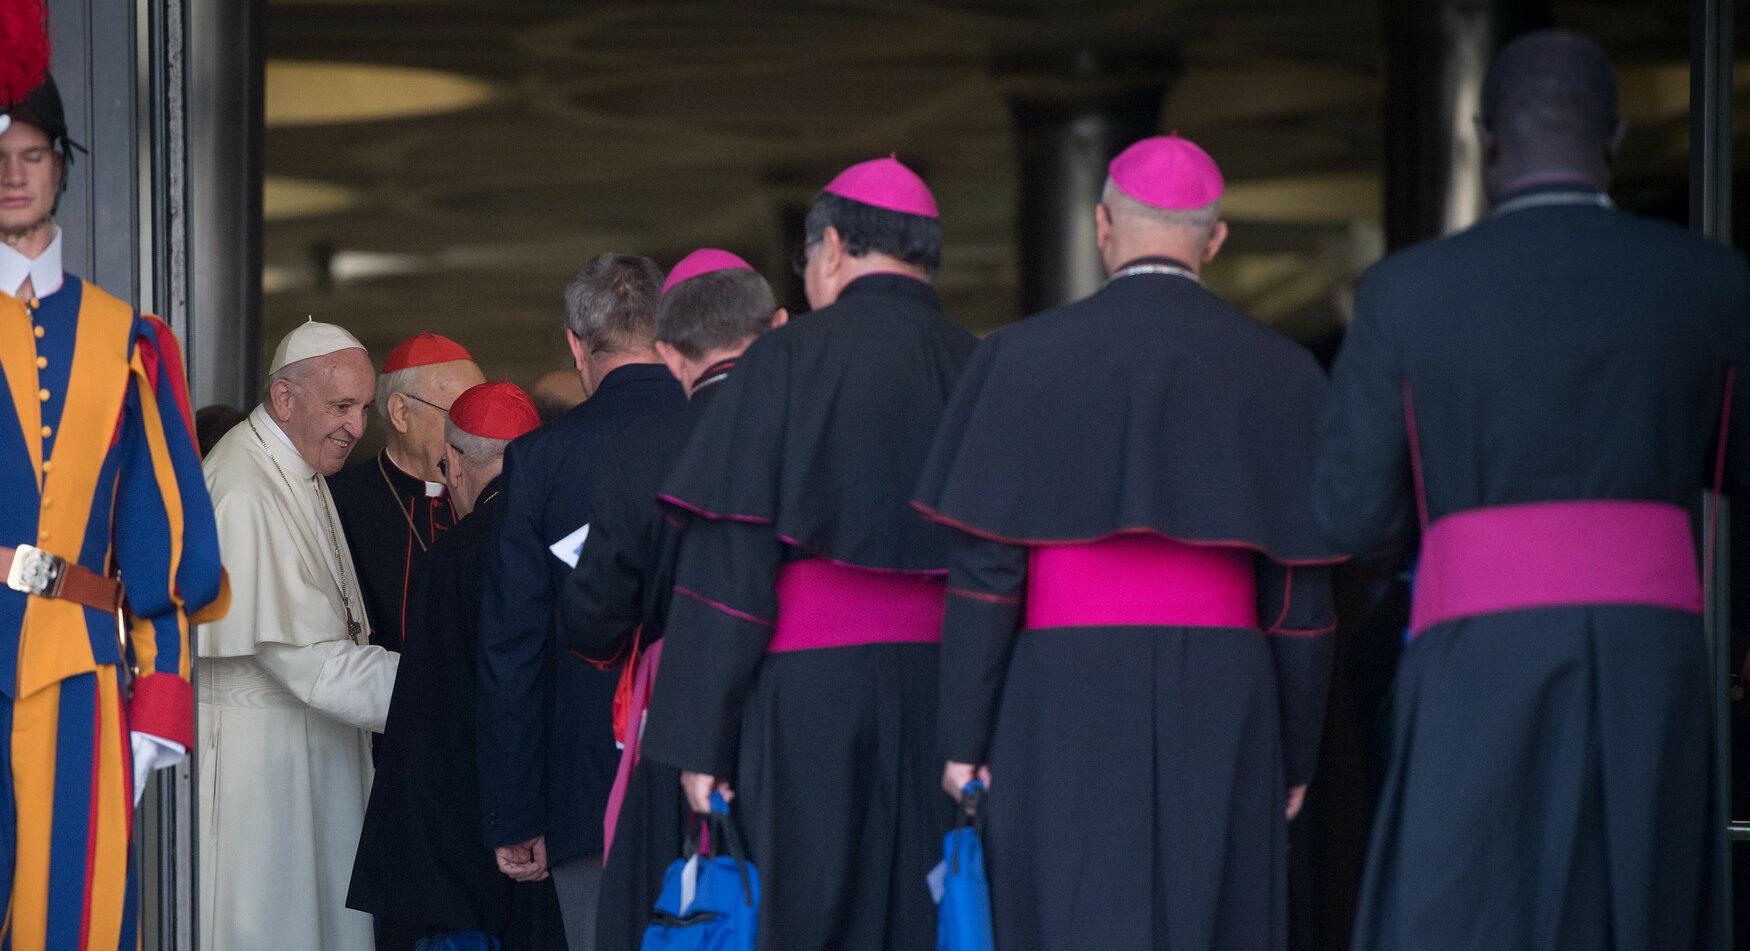 Unraveling Pontifical Secrets